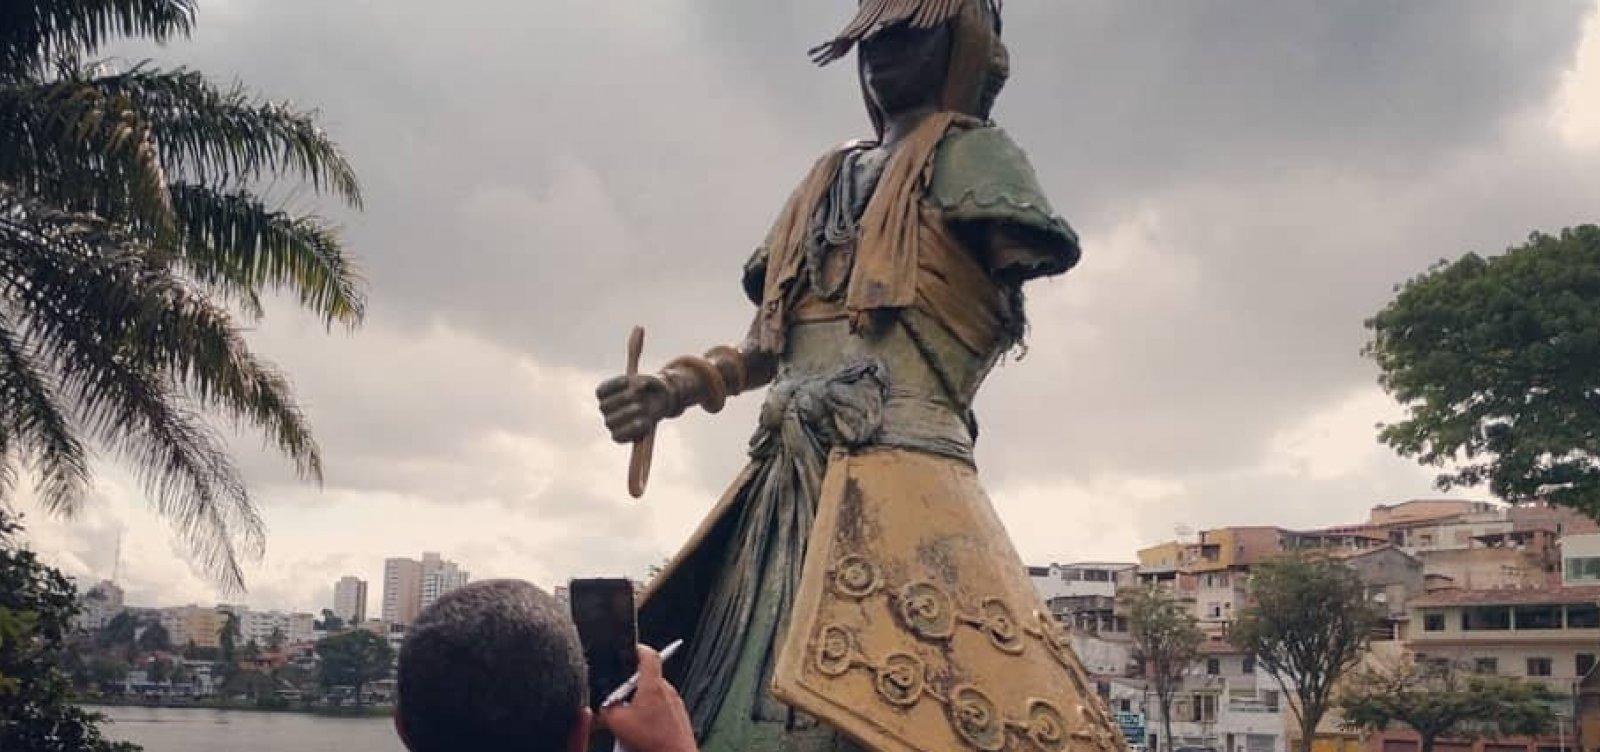 [Escultura de Oxumaré no Dique do Tororó tem braço arrancado; Conder suspeita de vandalismo]